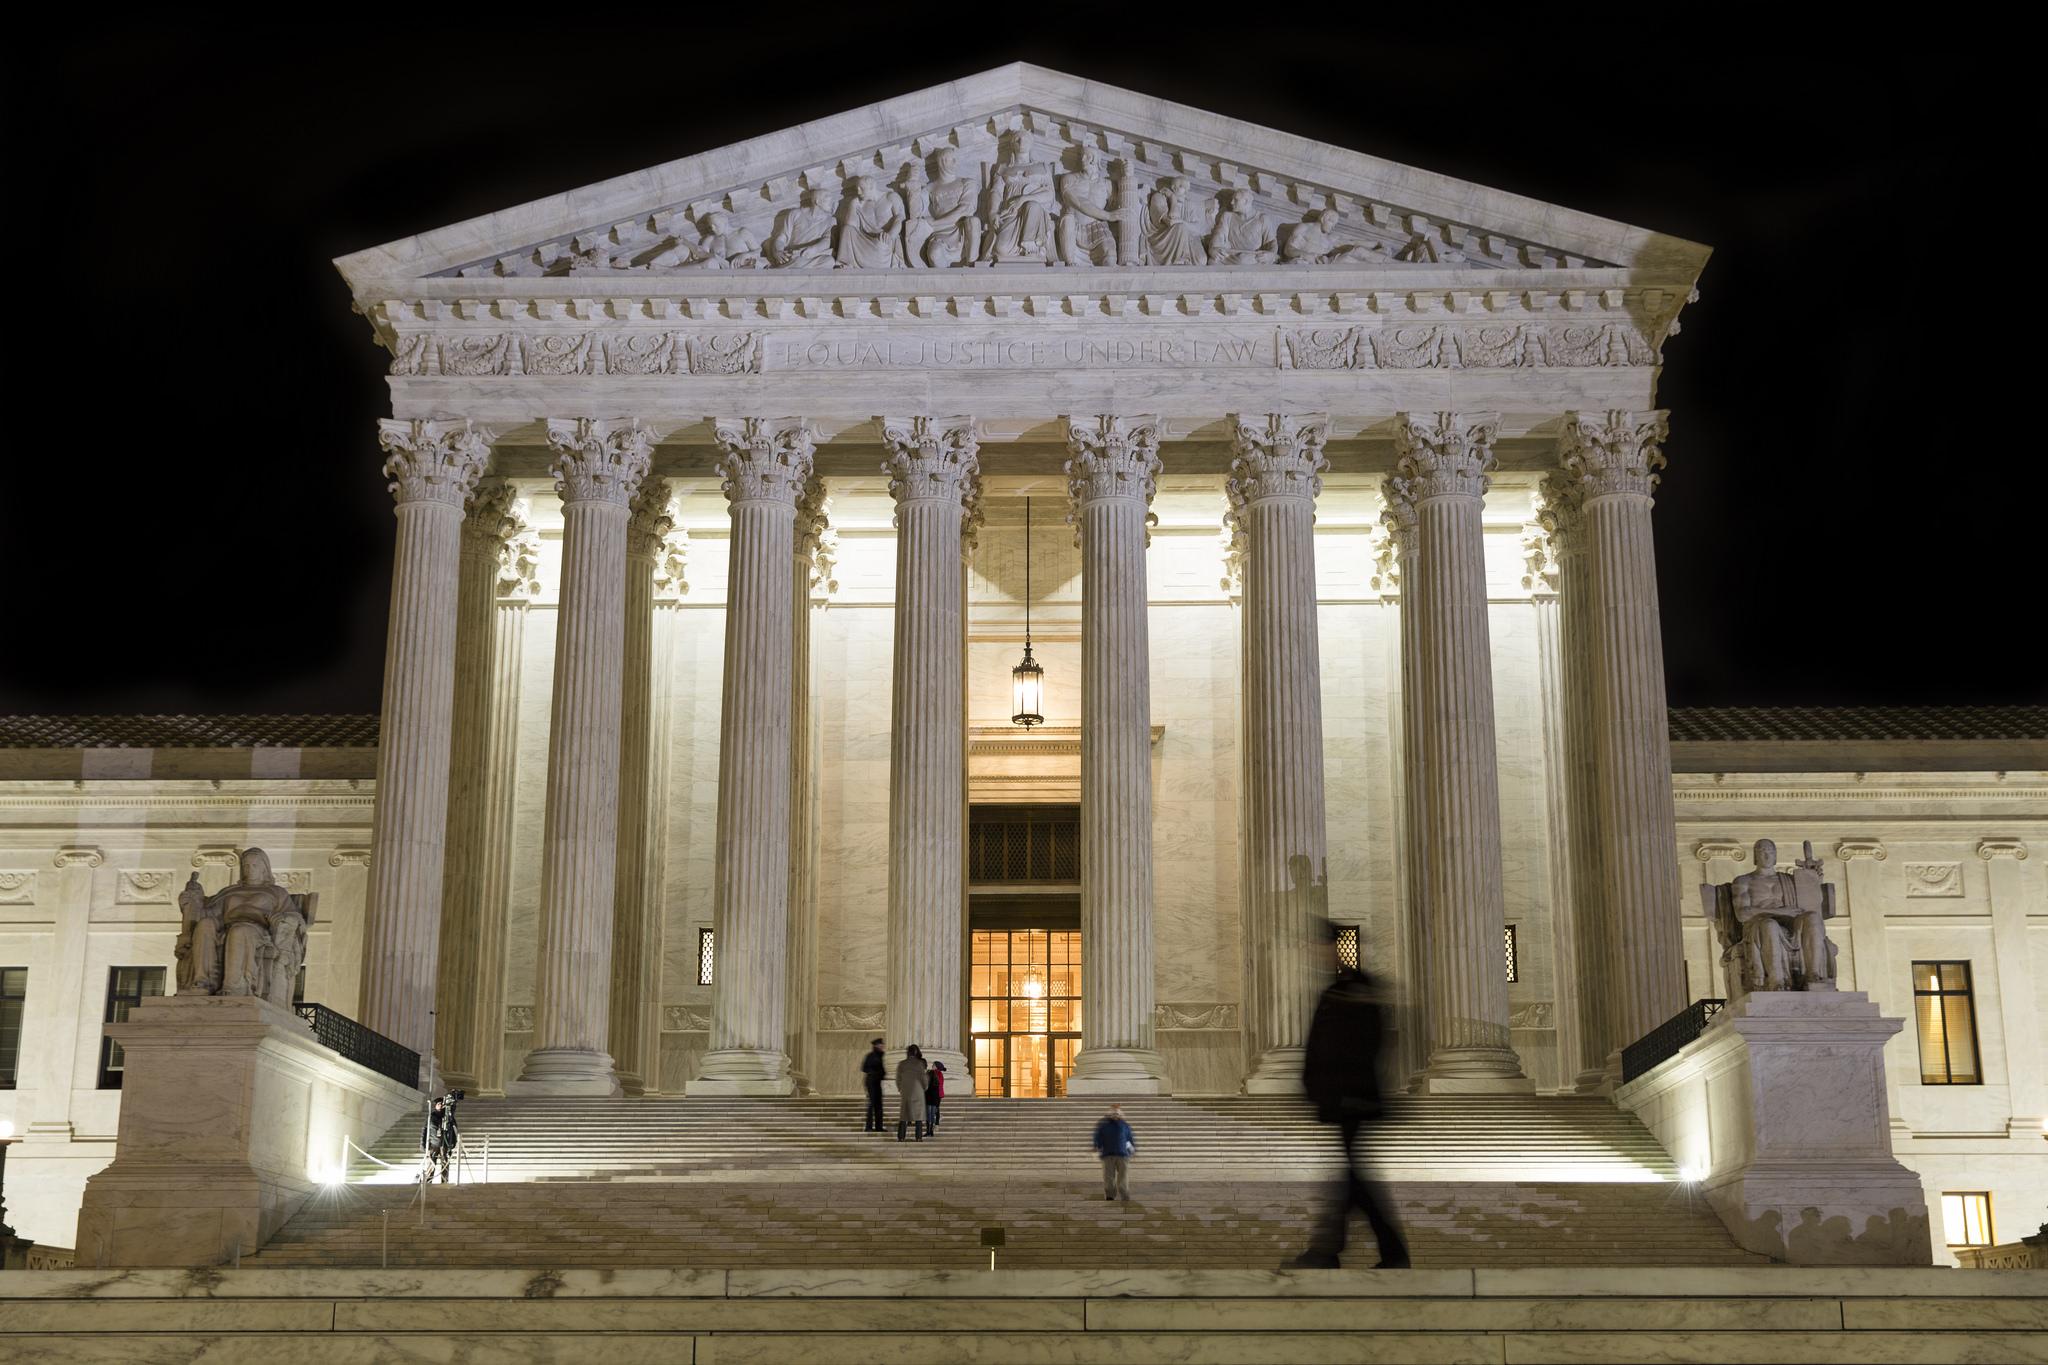 The Supreme Court open late for visitors to view Scalia in repose